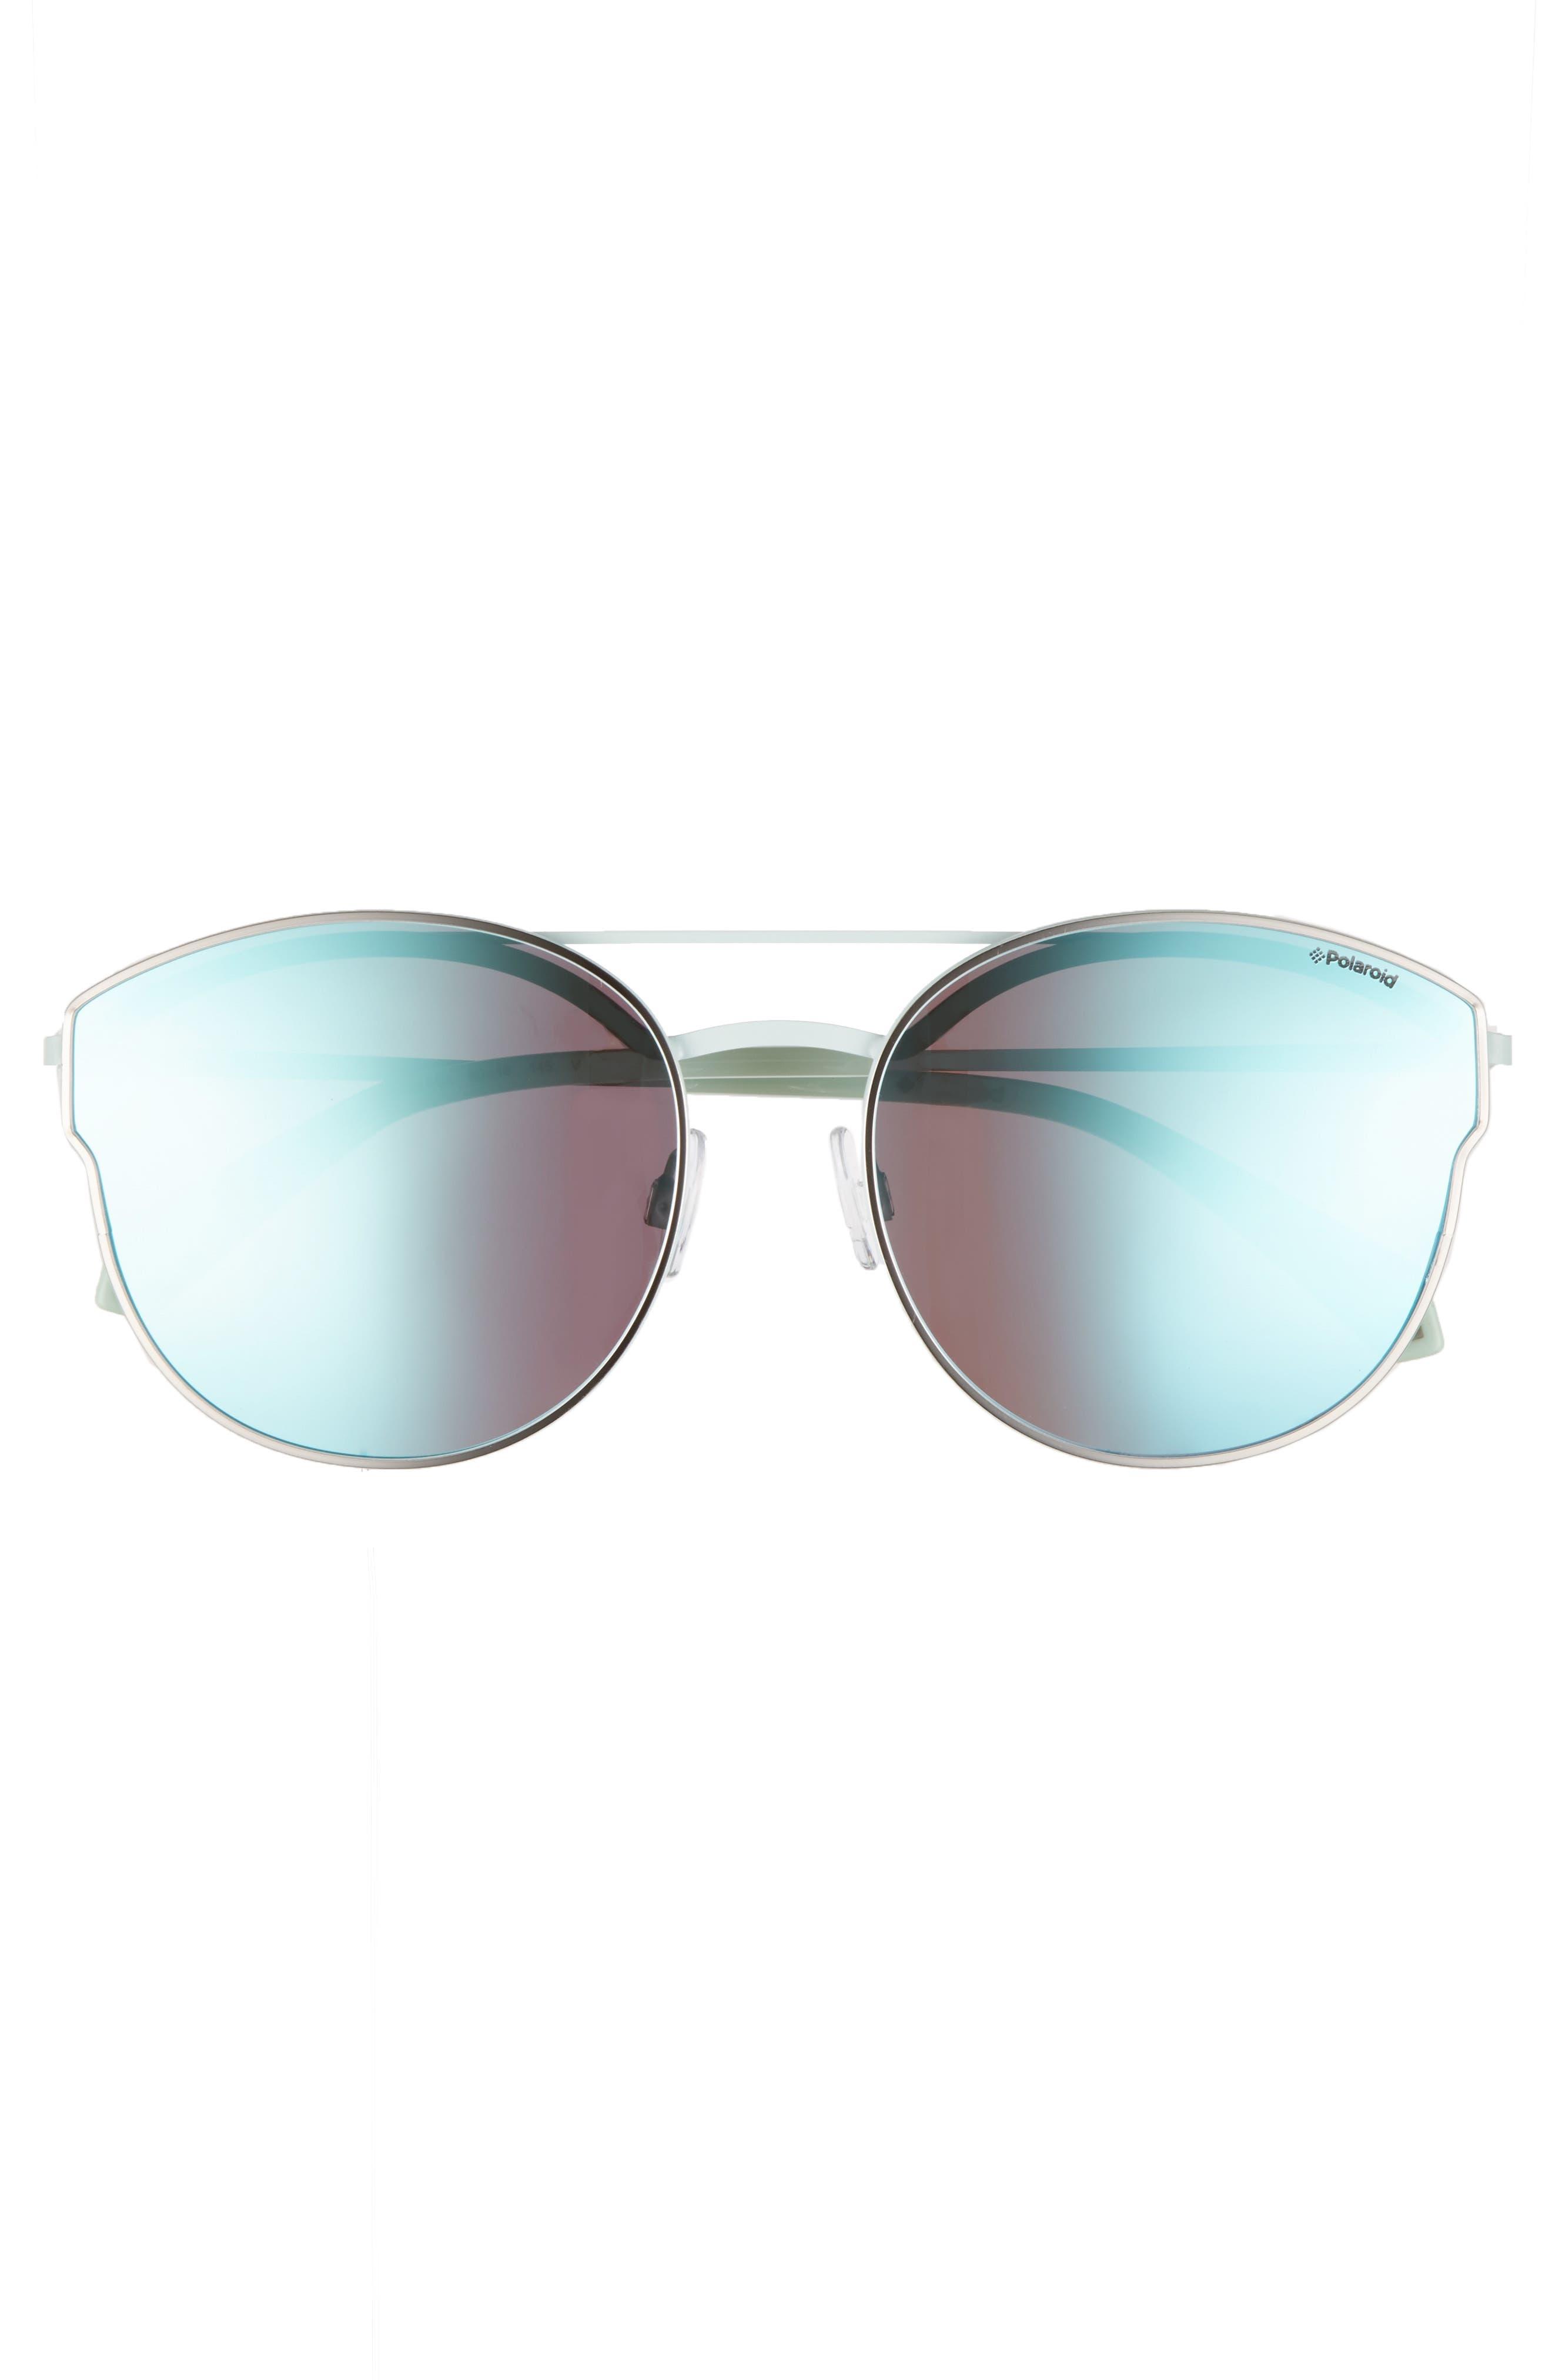 60mm Polarized Round Aviator Sunglasses,                             Alternate thumbnail 2, color,                             Ruthenium